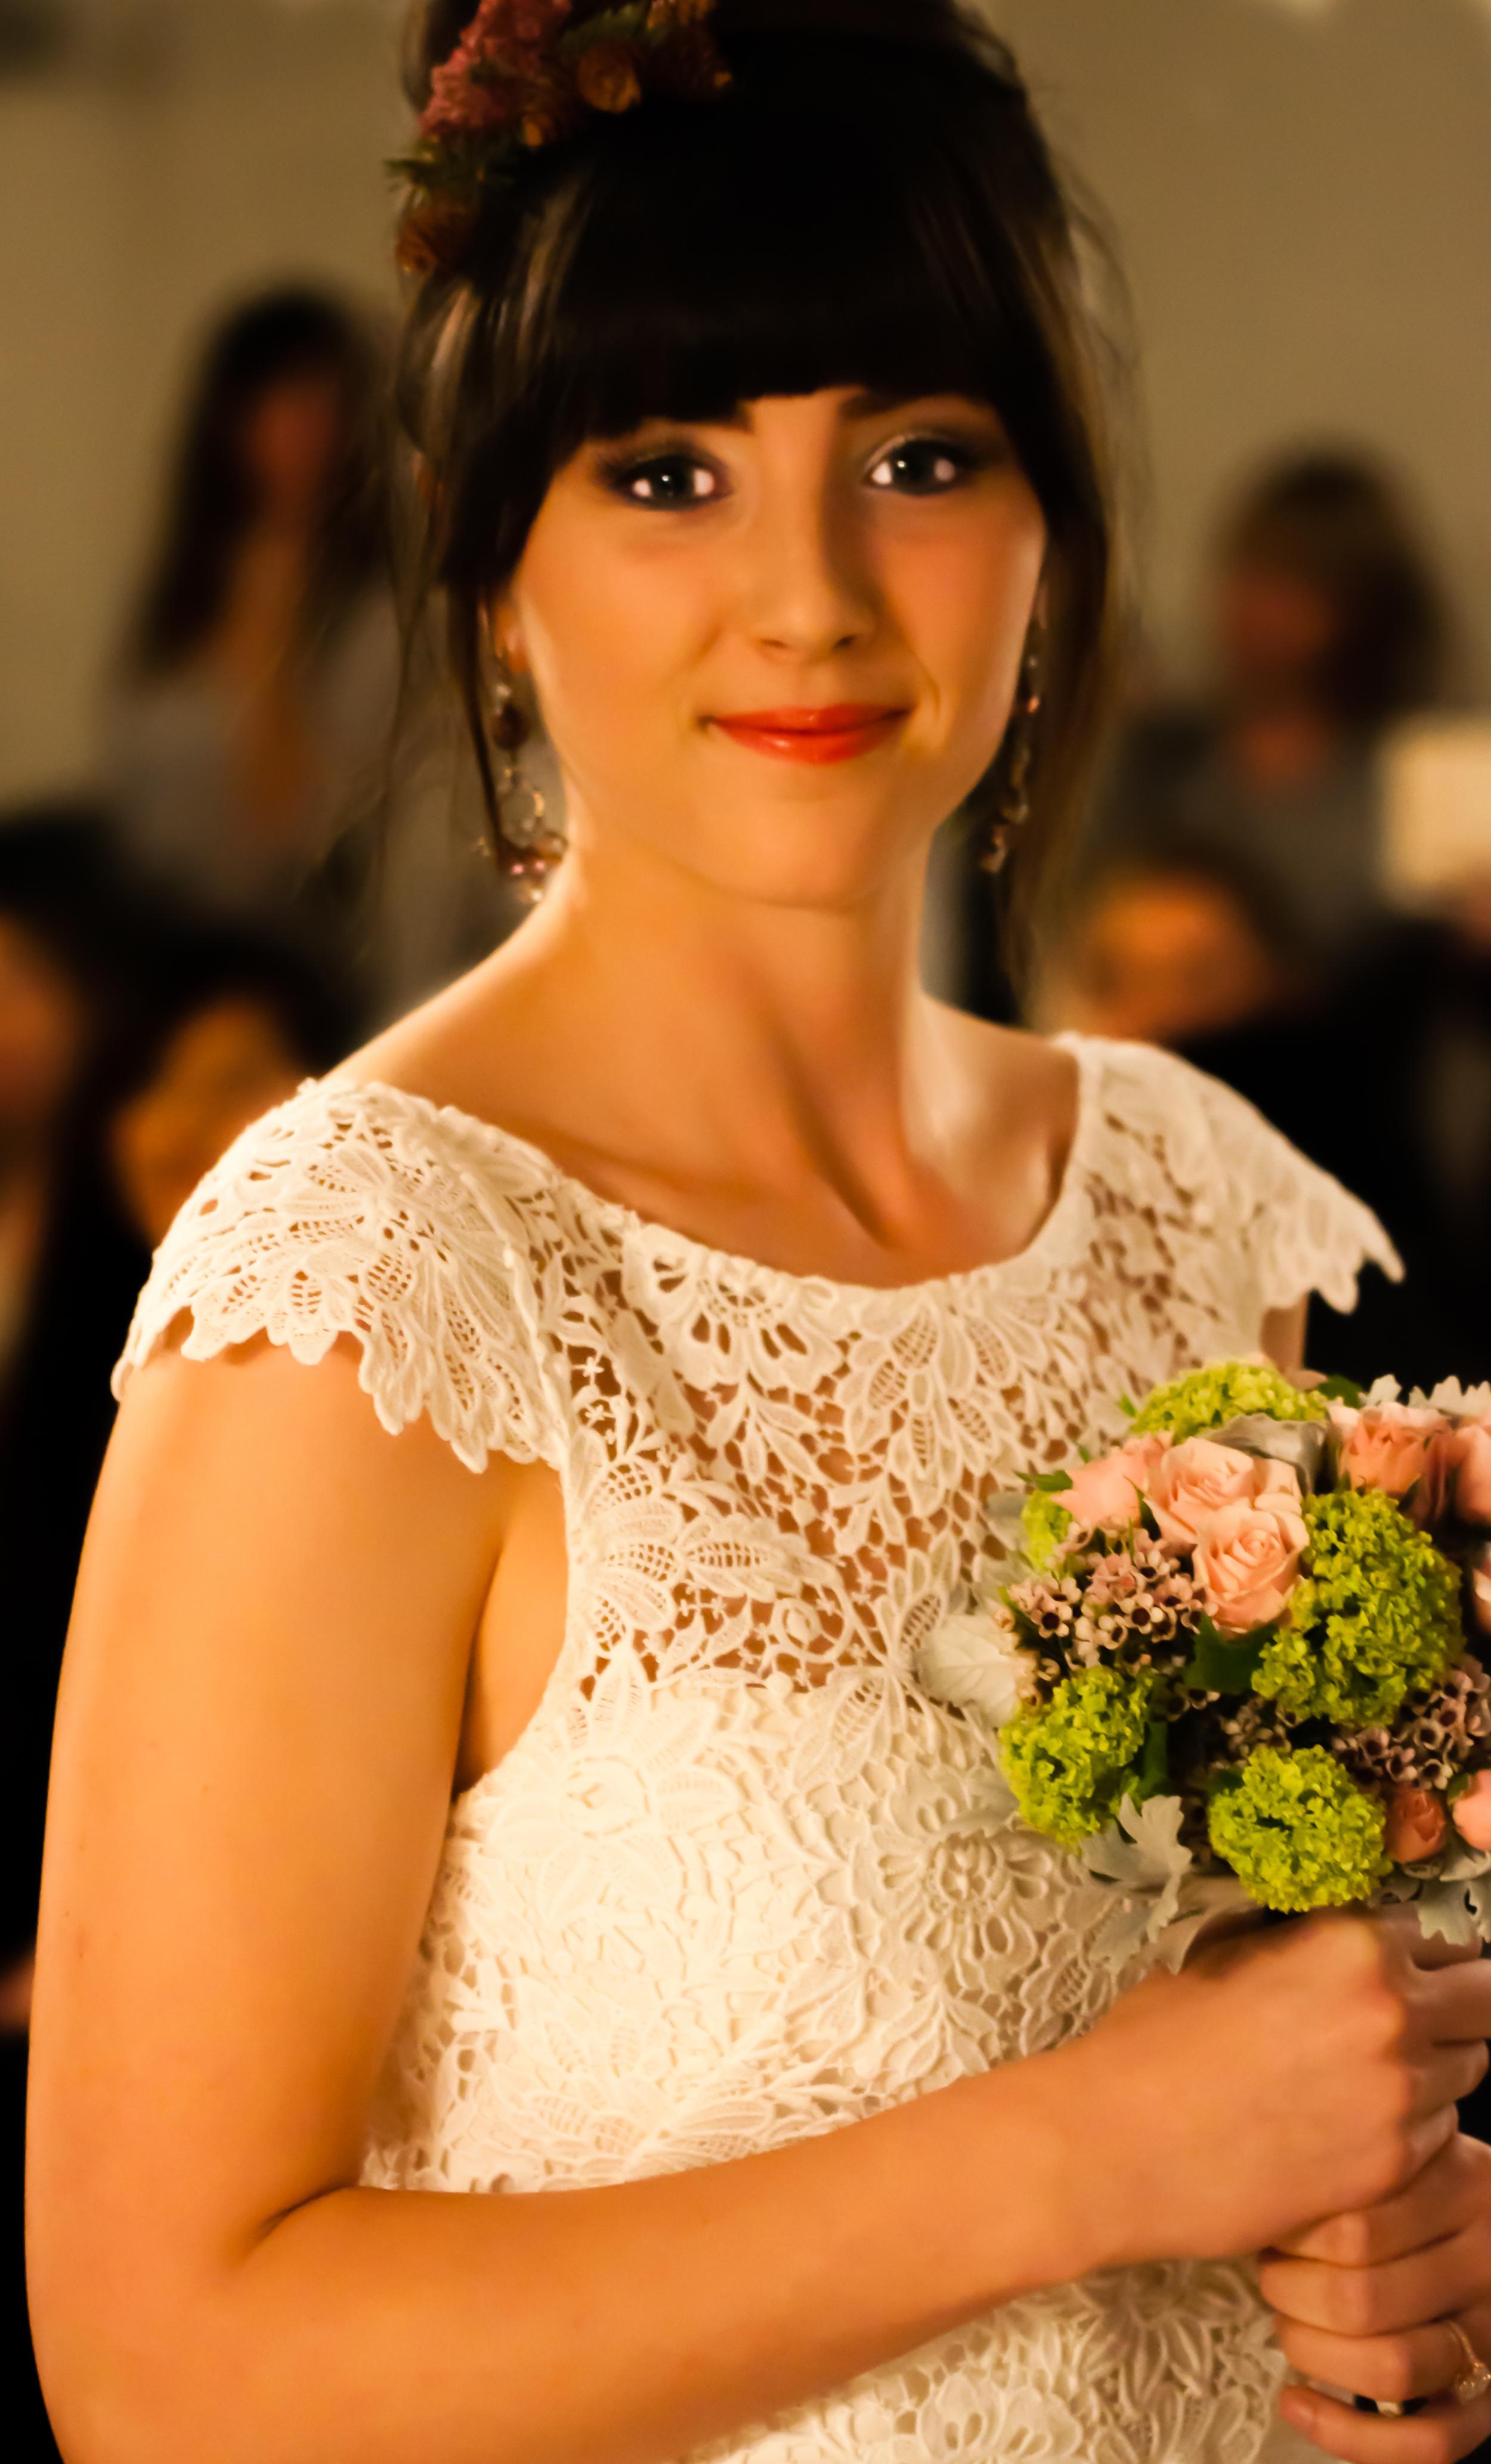 Sher Khan Niazi-Boutique Wedding Market-November 05, 2015DSC_6055.jpg